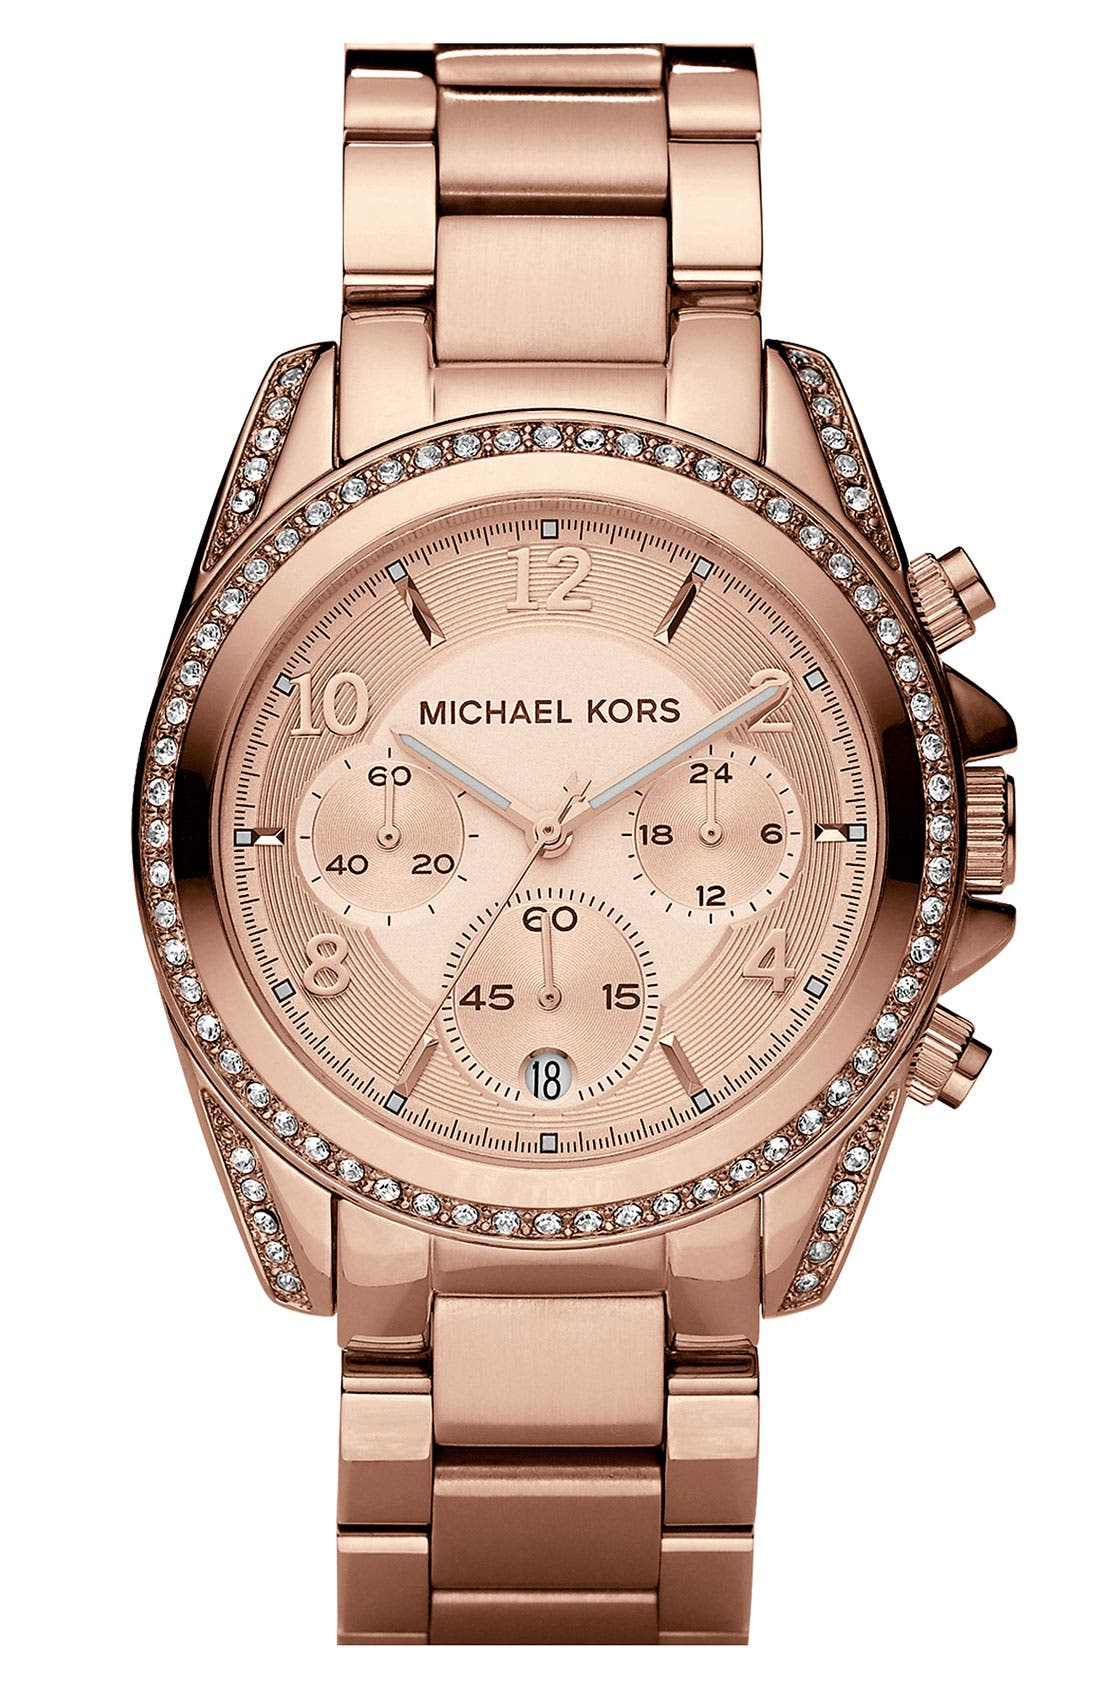 Main Image - Michael Kors 'Blair' Chronograph Watch, 39mm